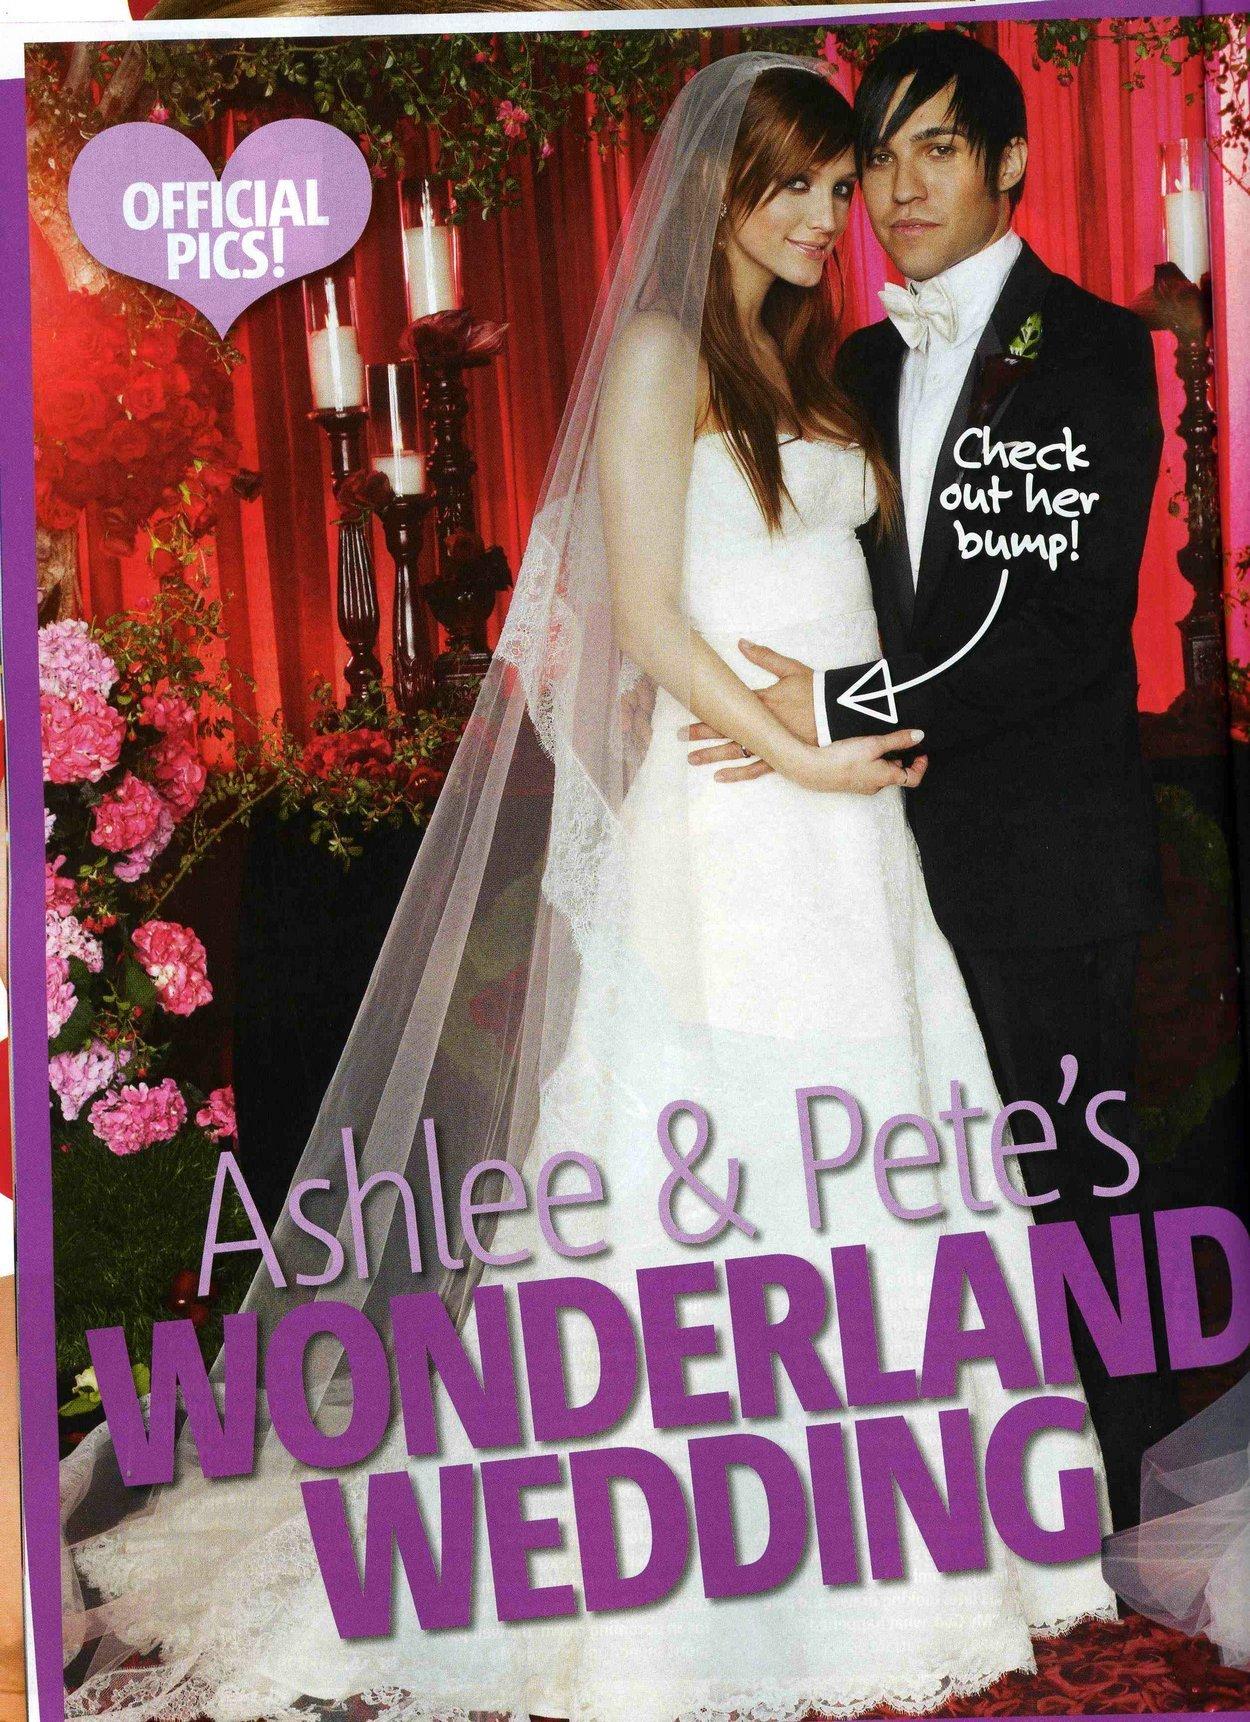 Ashlee  Pete Wedding  Ashlee Simpson Photo 1414983  Fanpop